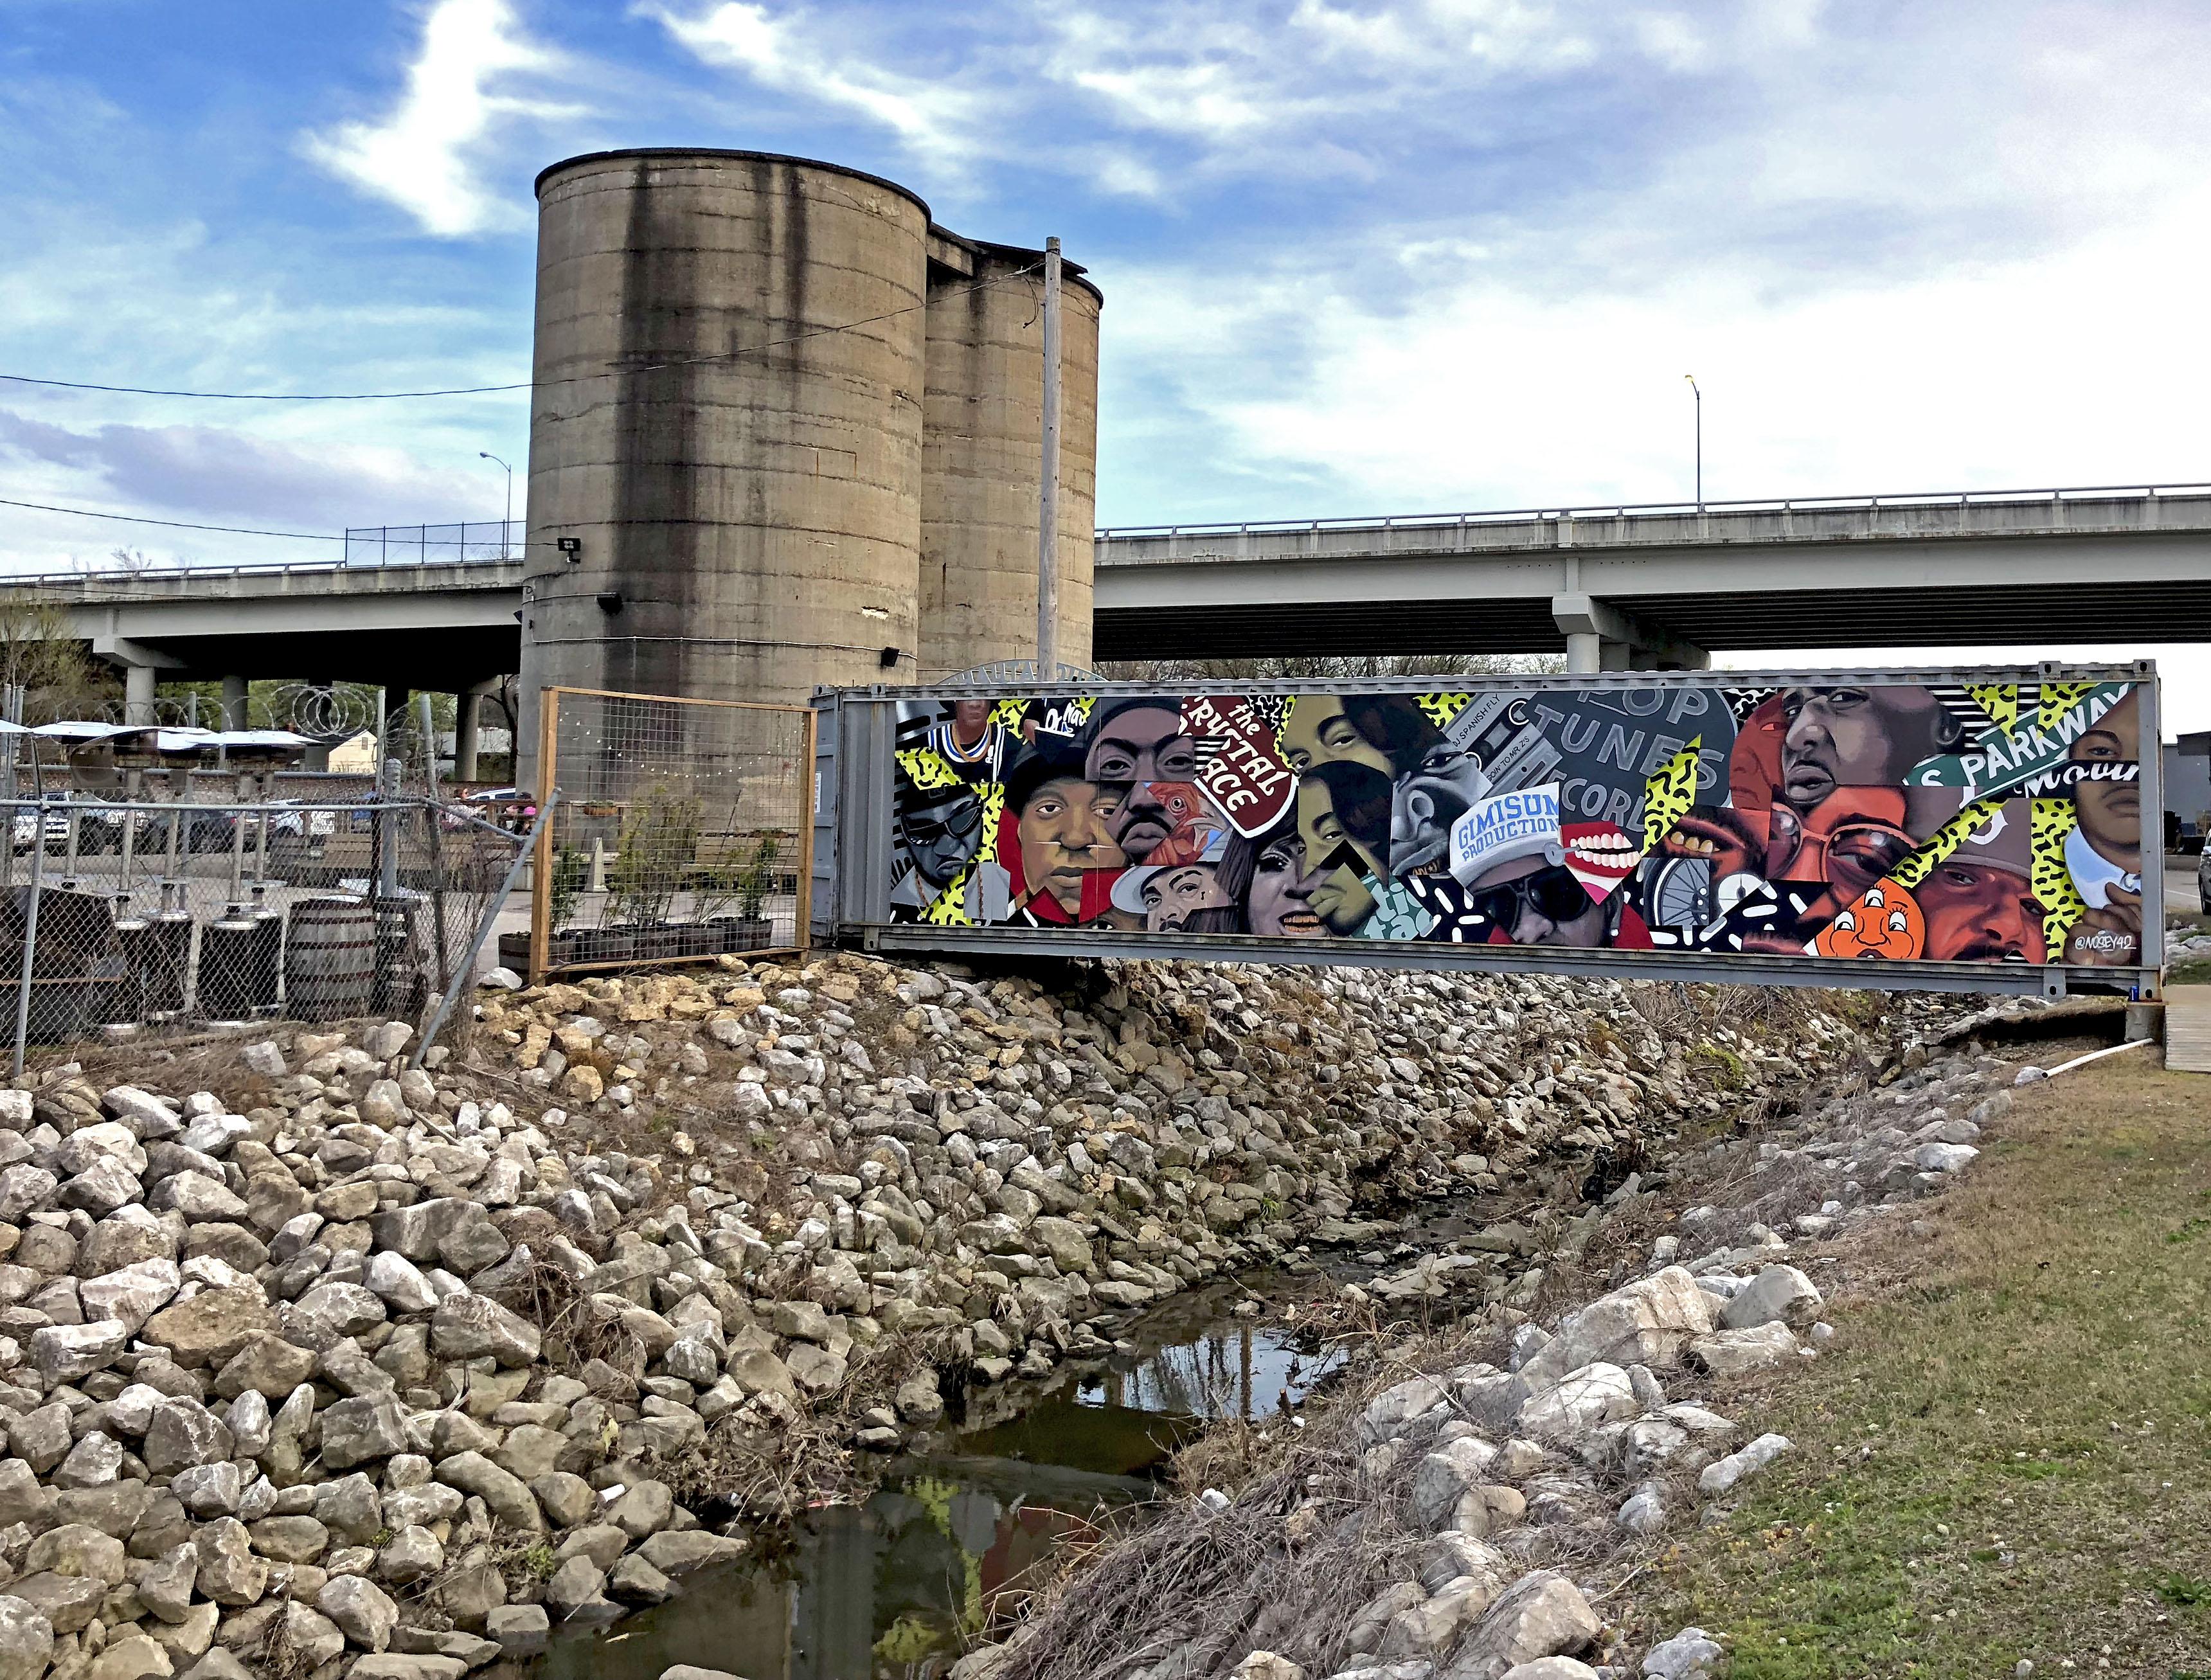 http://BRANDONGAIAMARSHALL.COM/wp-content/uploads/2018/04/Memphis_Rap_Legends_Mural2.jpg